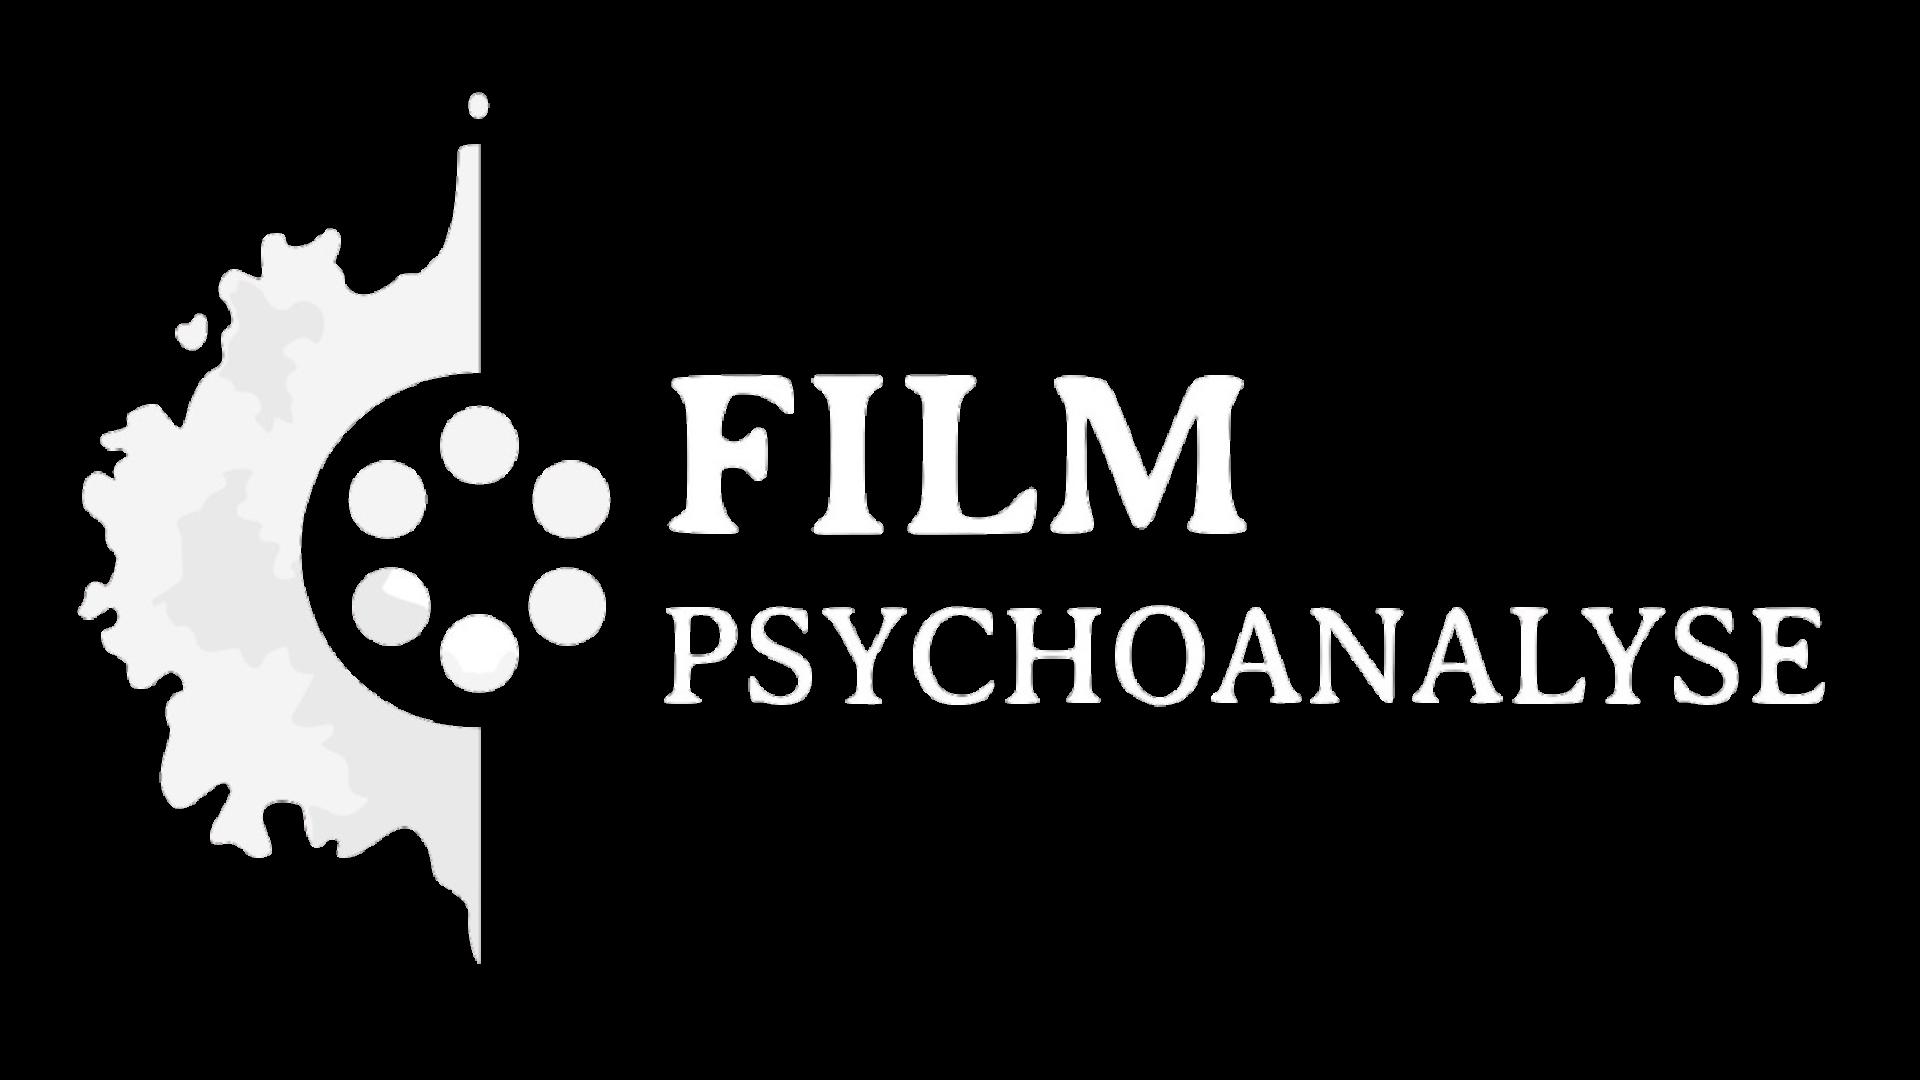 Filmpsychoanalyse